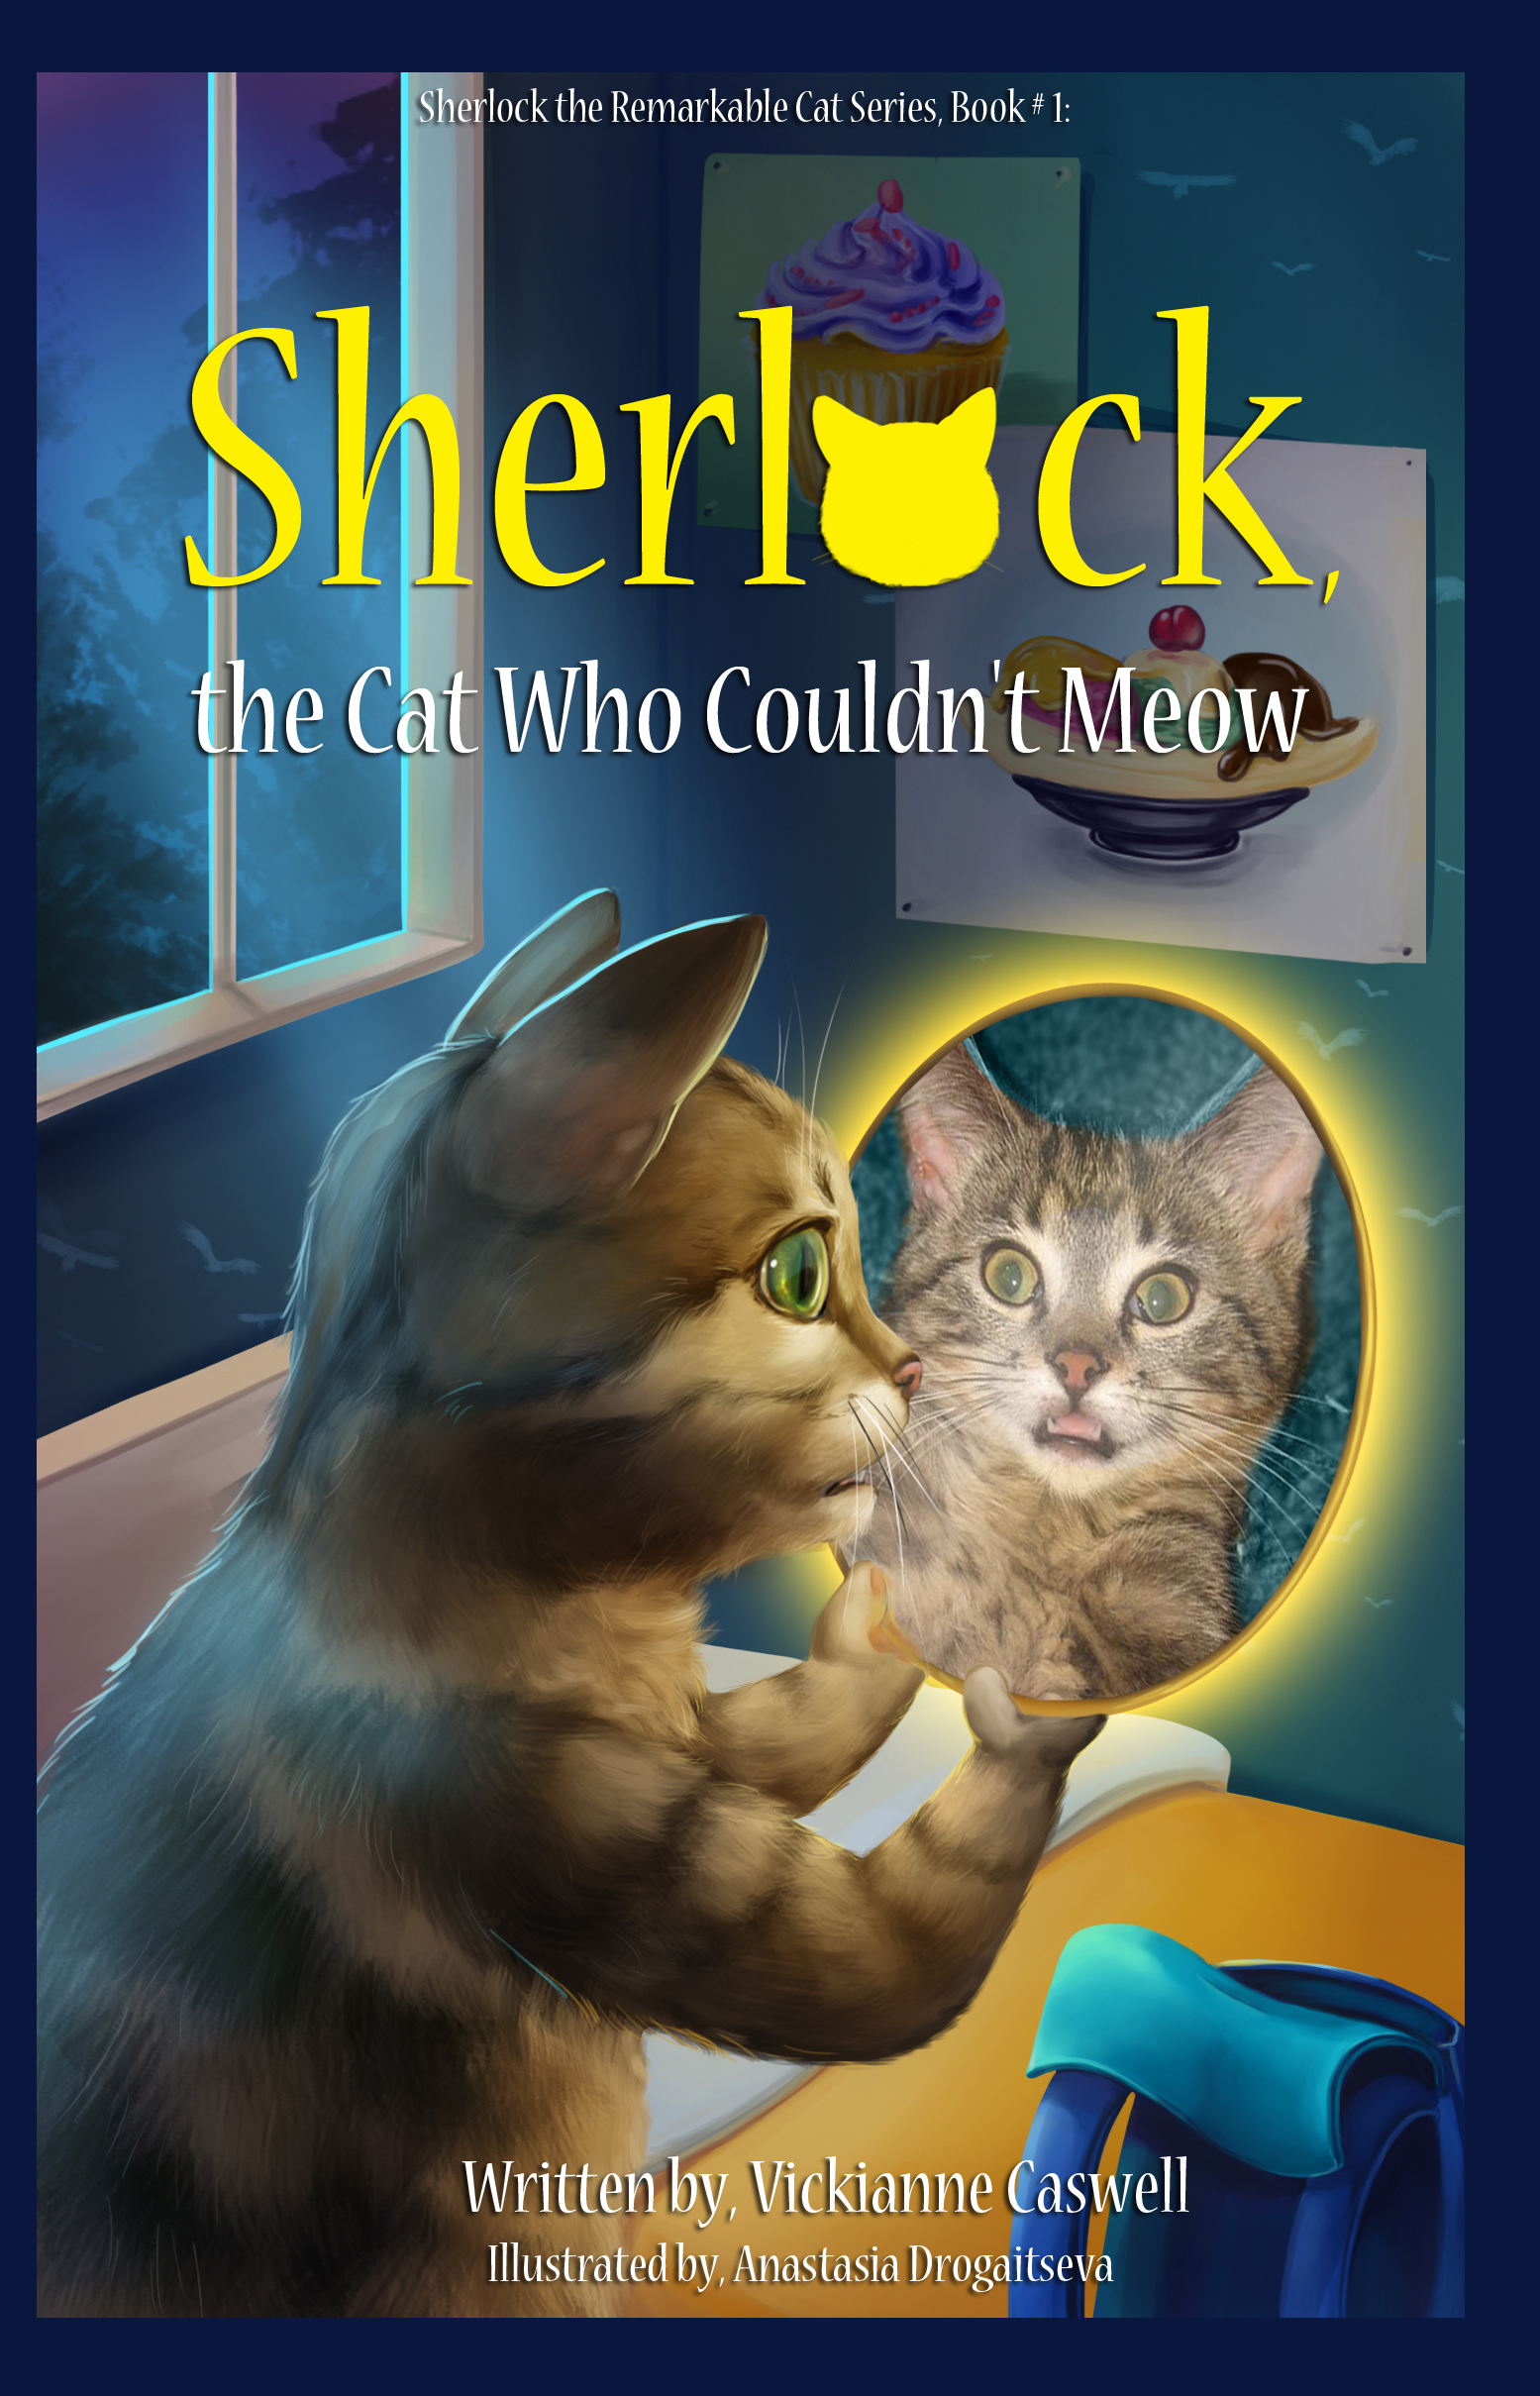 Sherlock Bk 1 Front Cover